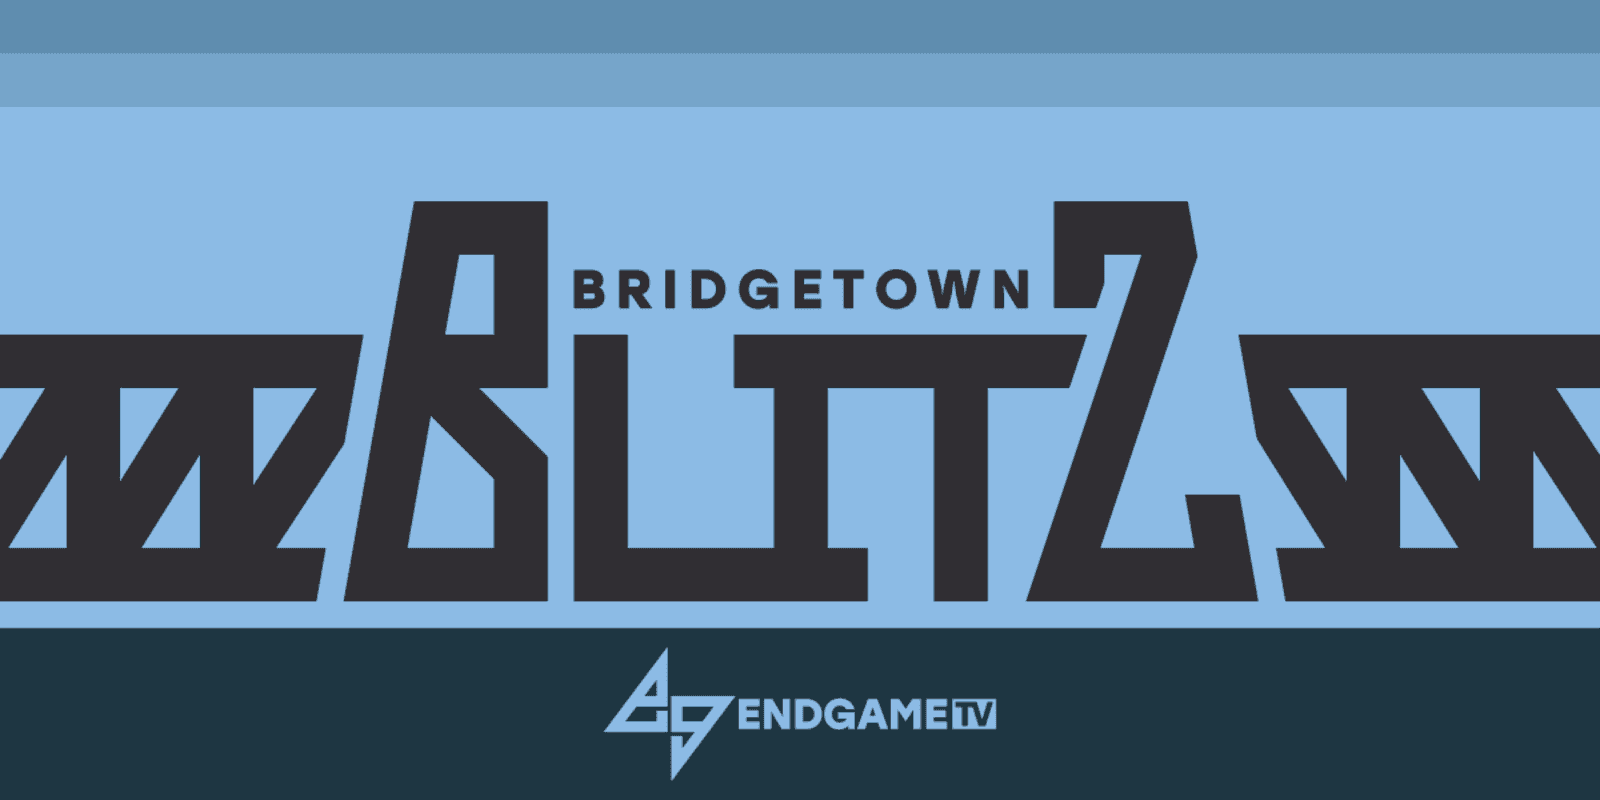 Smash Tour: May 5-7 ~ Bridgetown Blitz, Glitch 3, and more! - n3rdabl3